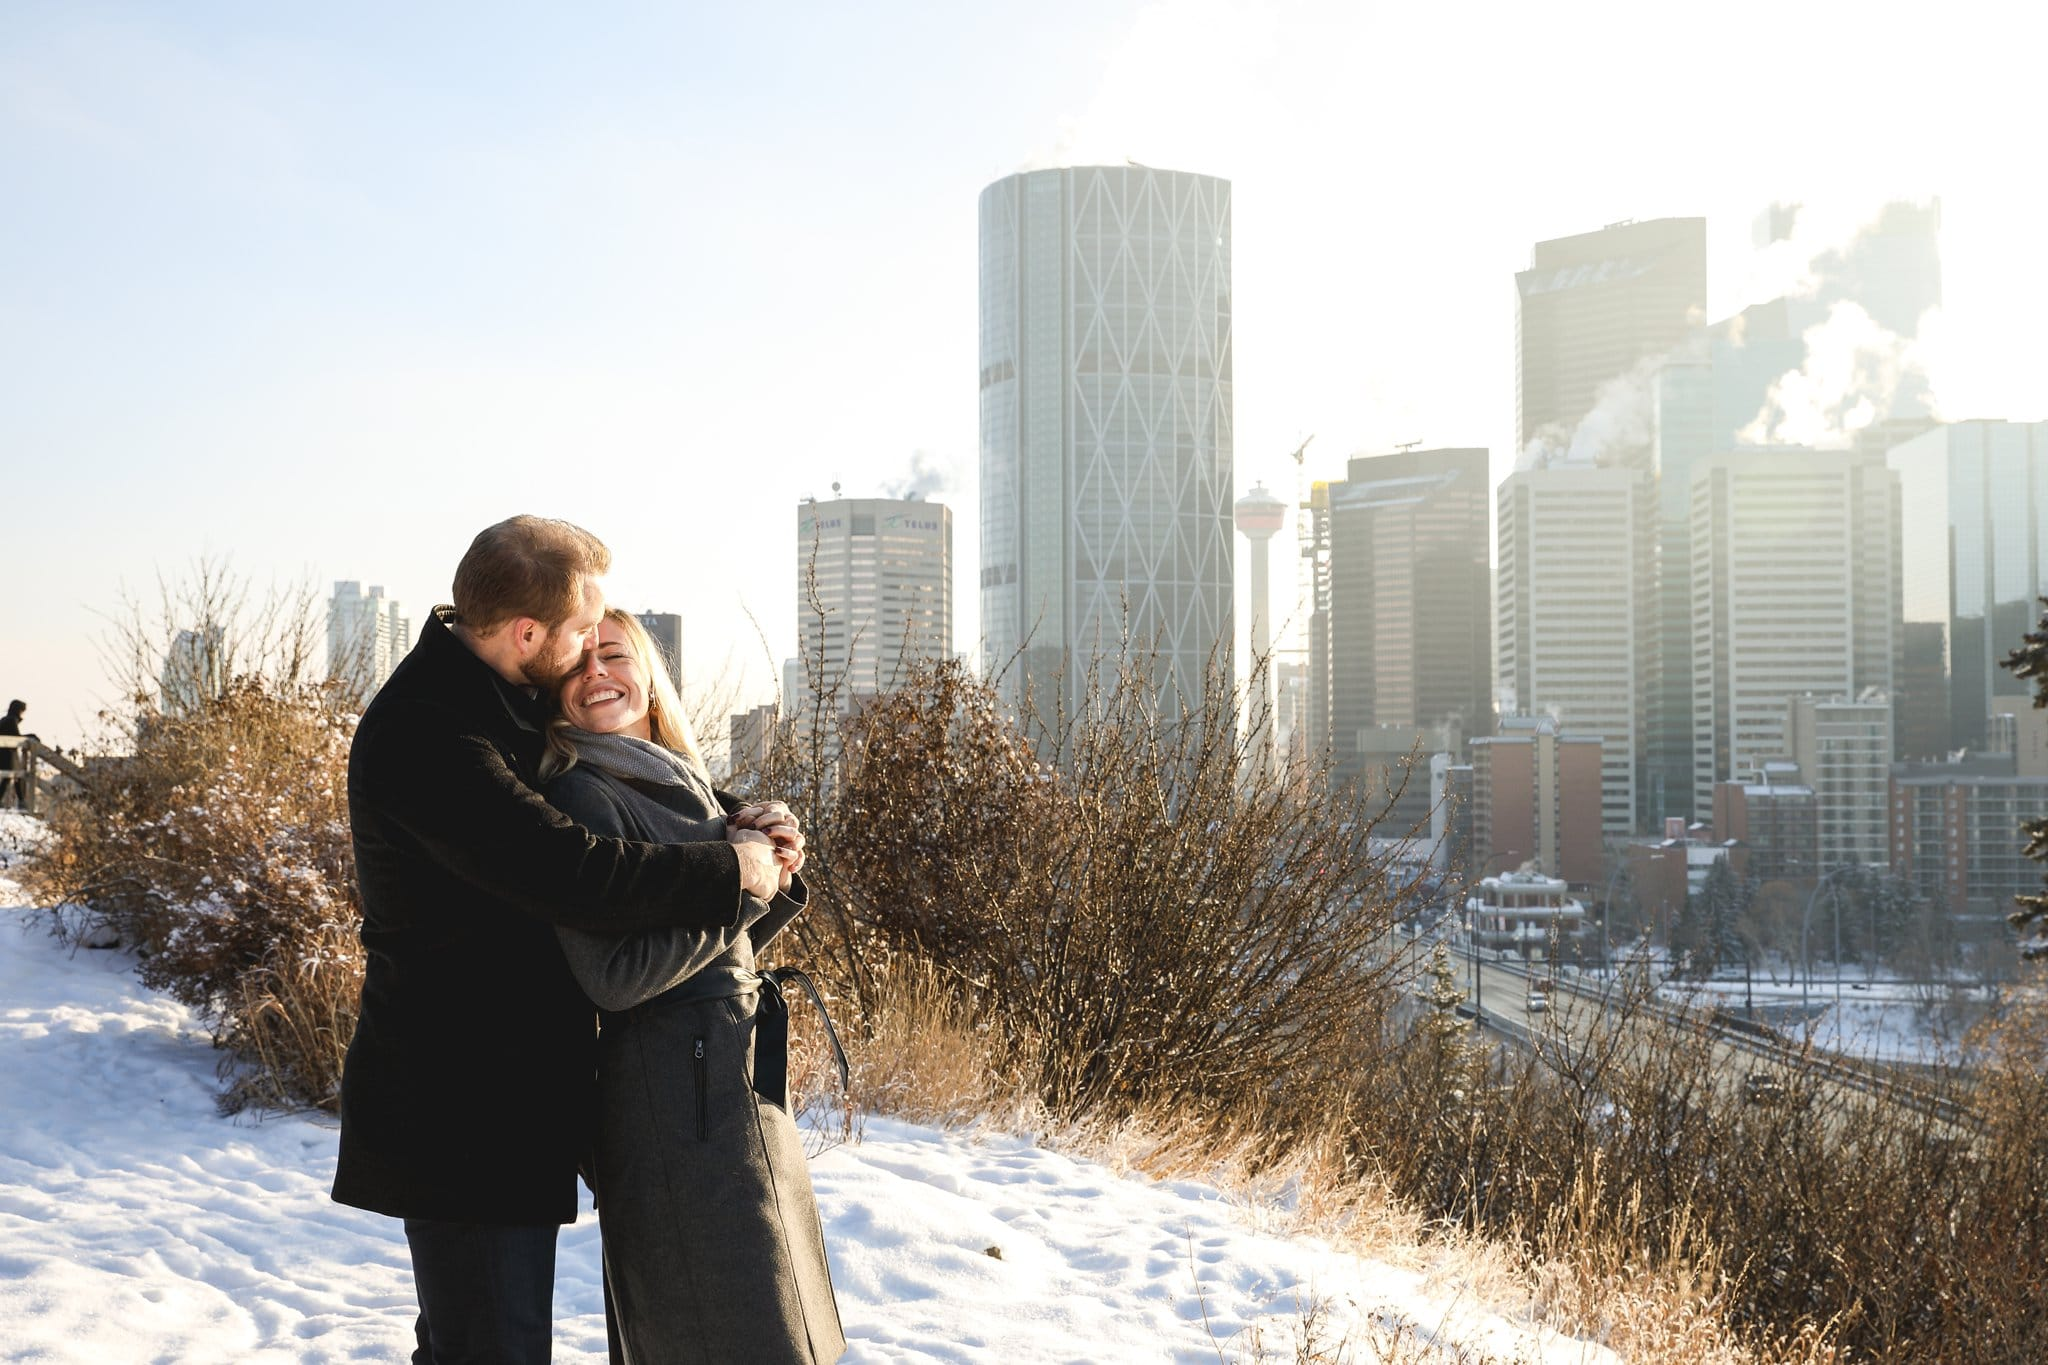 Ashley Daphne Photography Calgary Couple Wedding Photographer Engagement Photos Proposal Photos_0018.jpg